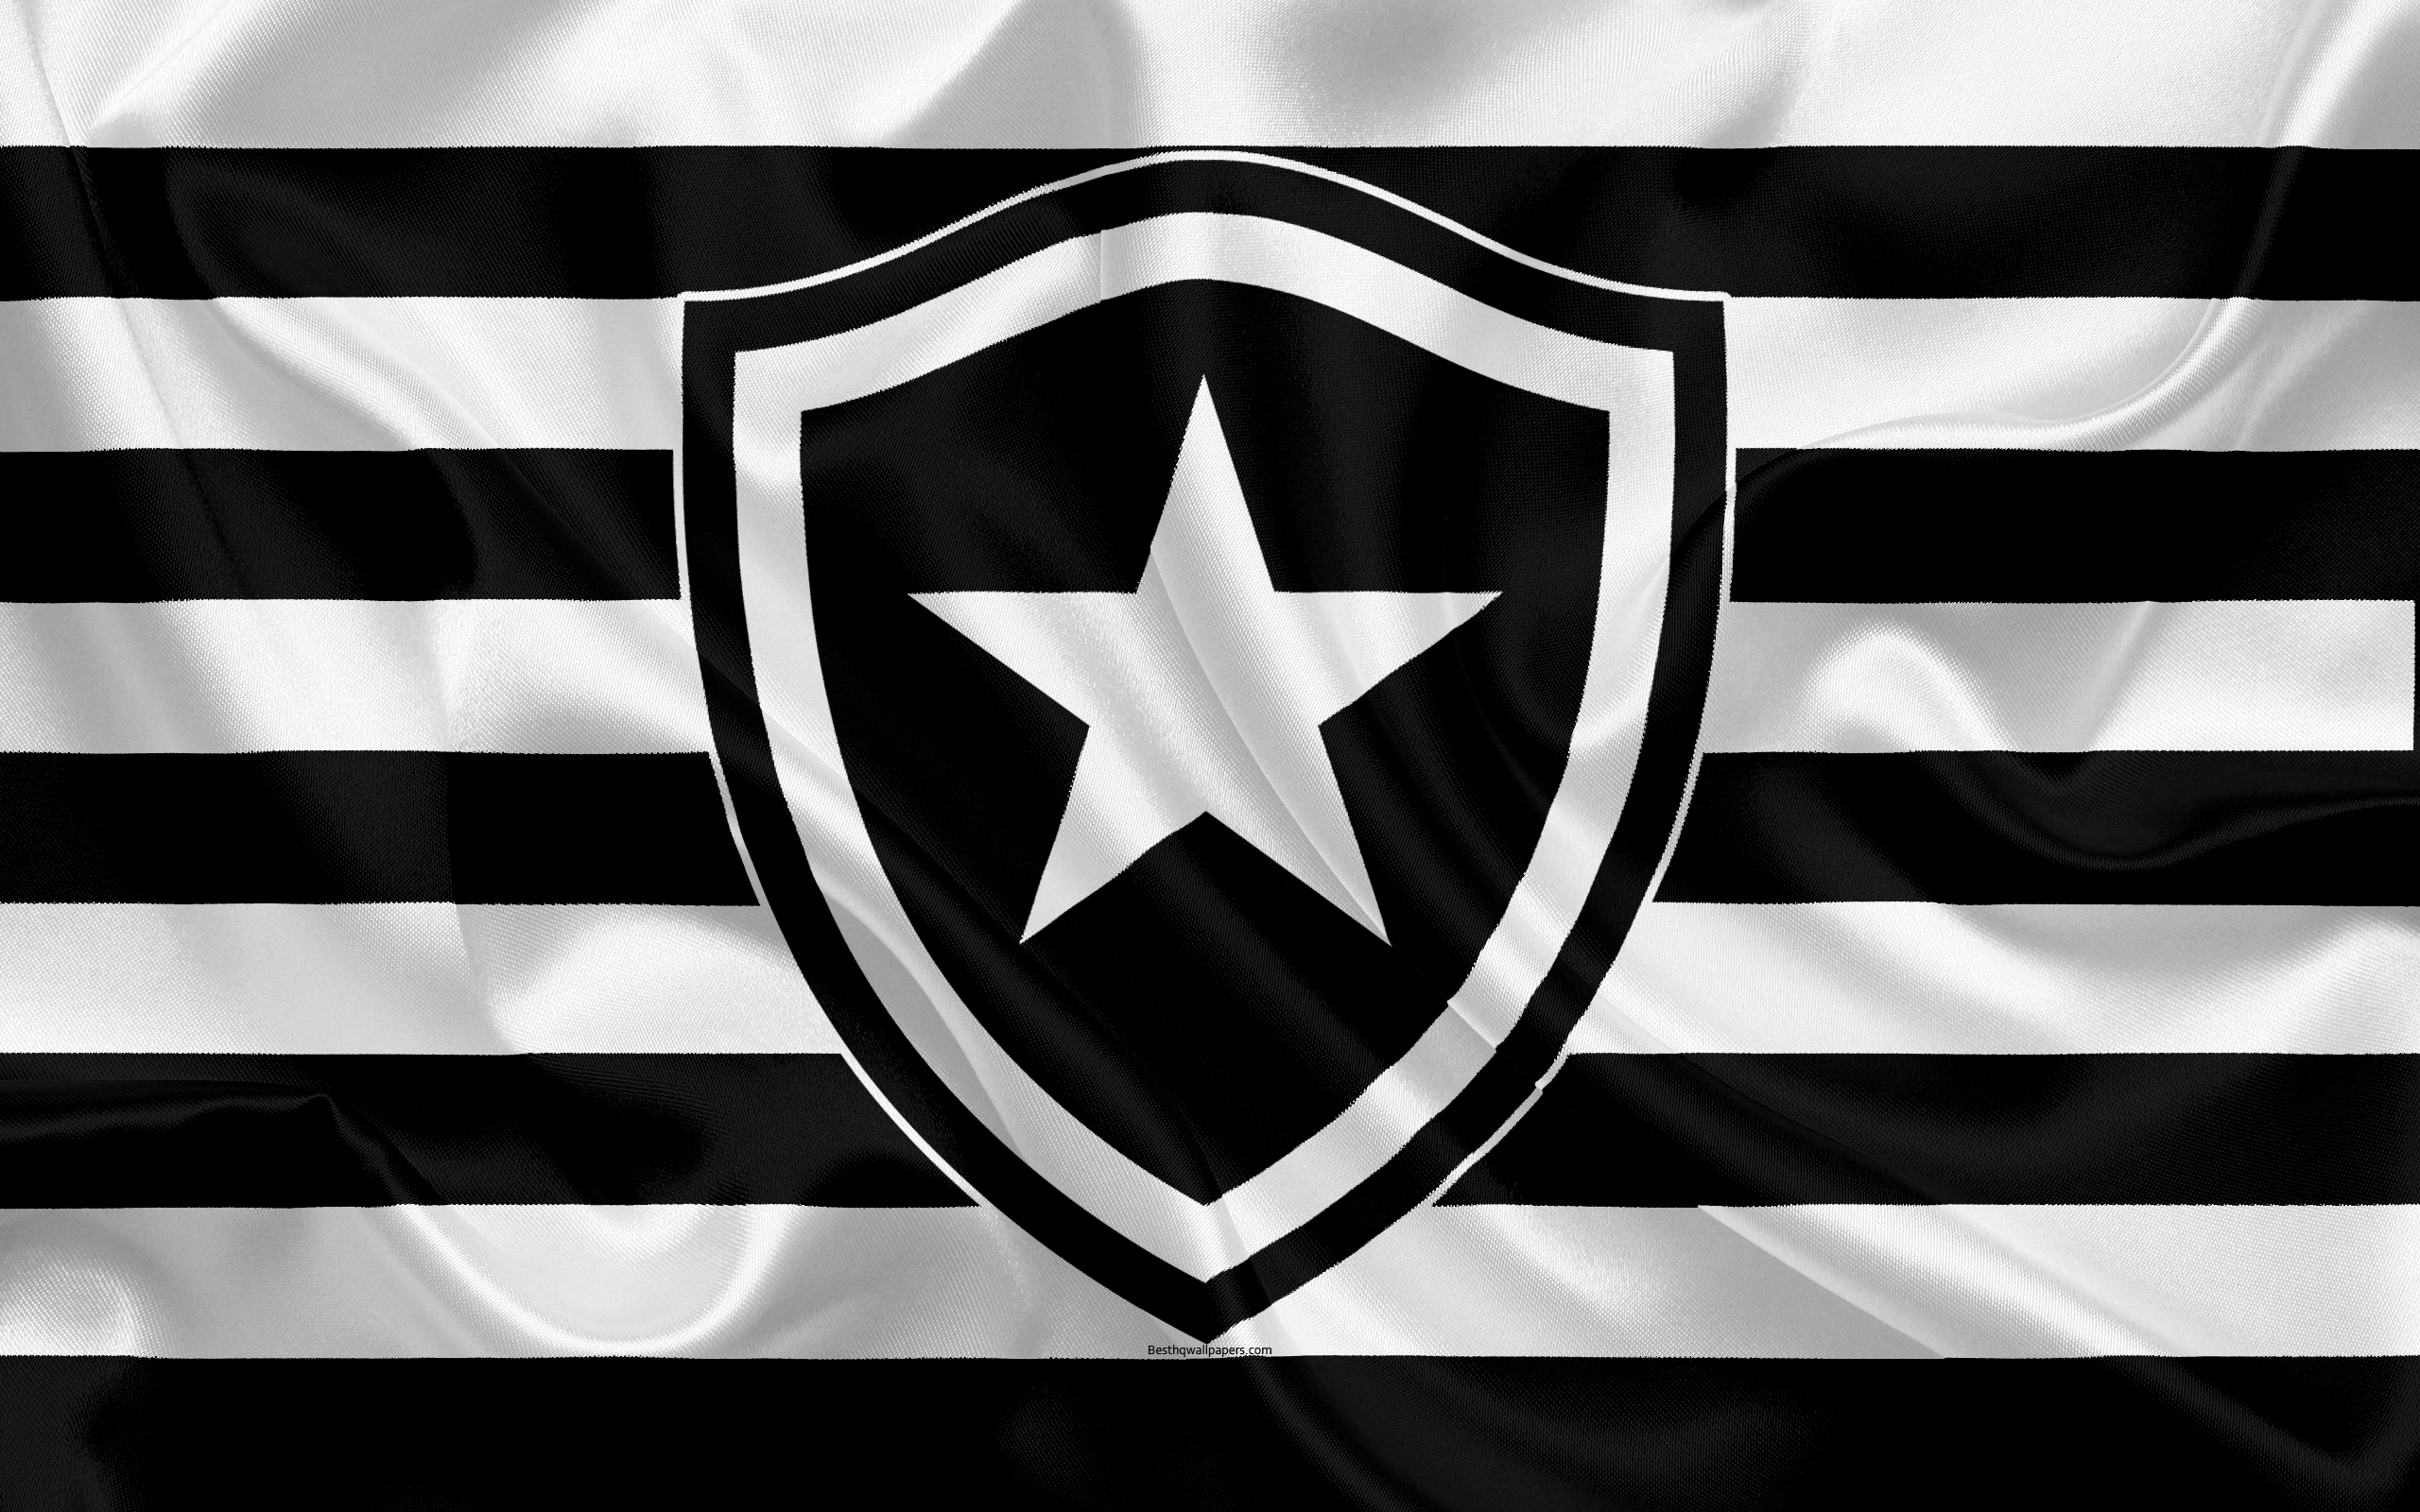 Download wallpapers Botafogo RJ FC Brazilian football club 2560x1600